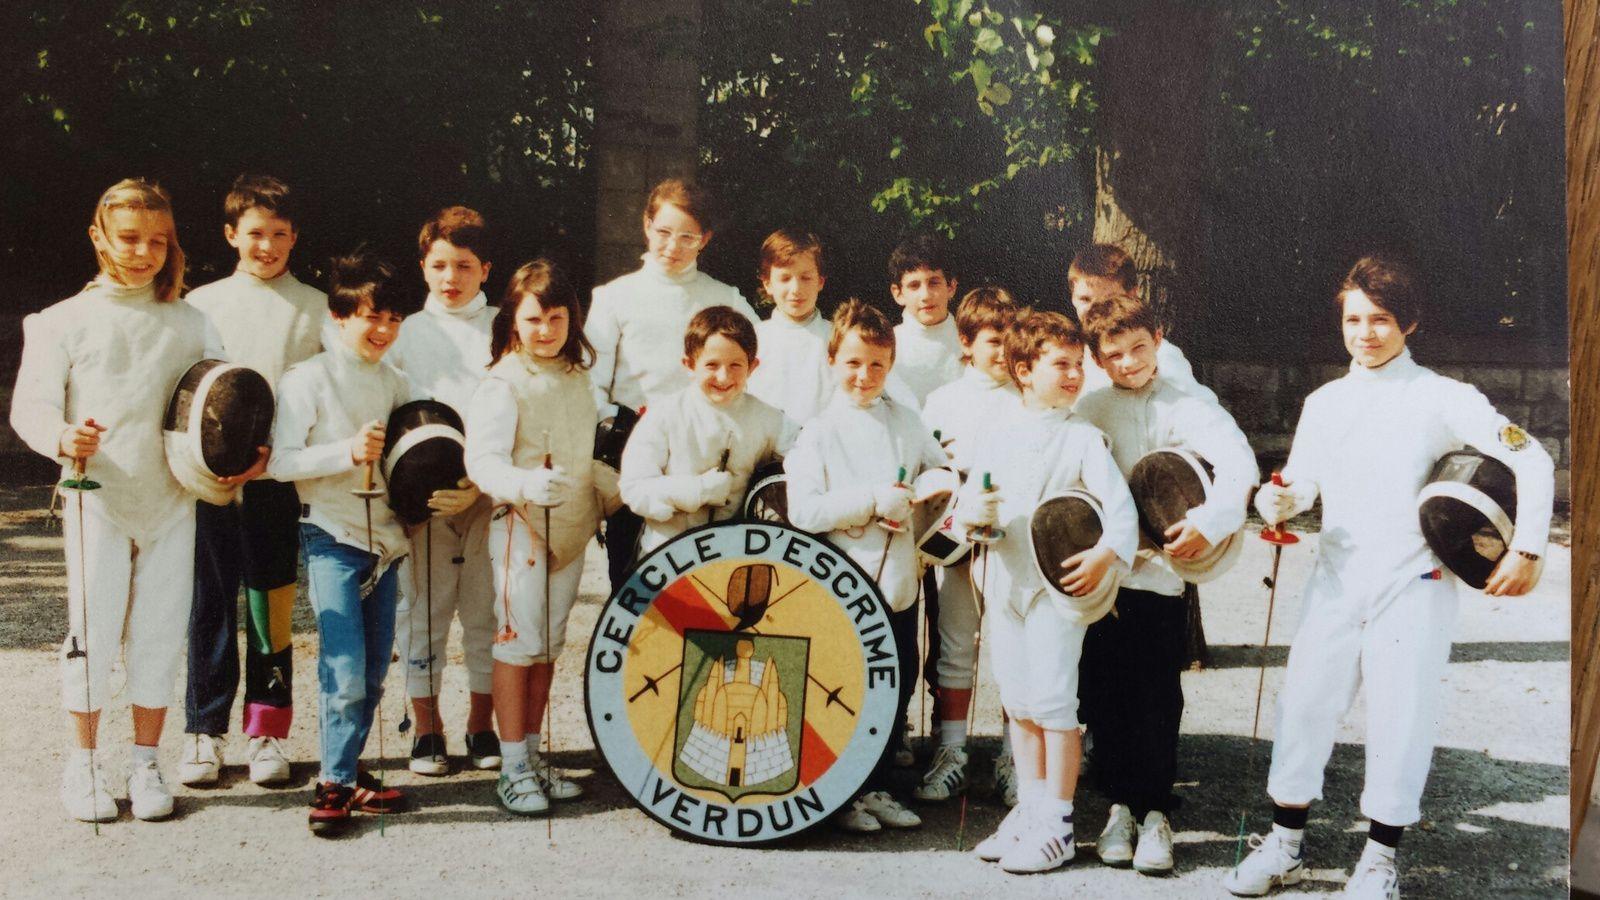 Cercle d'escrime de Verdun - 1989